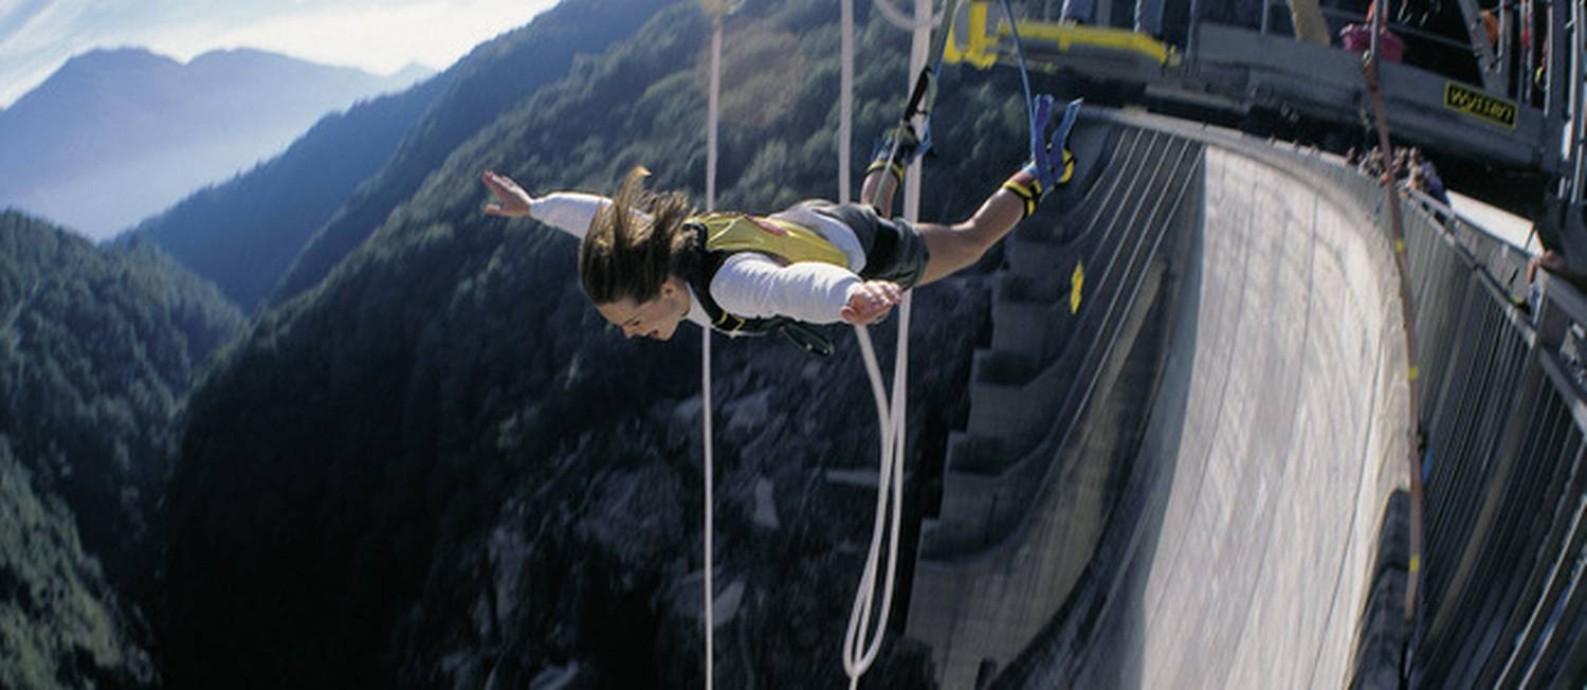 Bungee jump em Tessin, na Suíça Foto: Christof Sonderegger / Switzerland Tourism